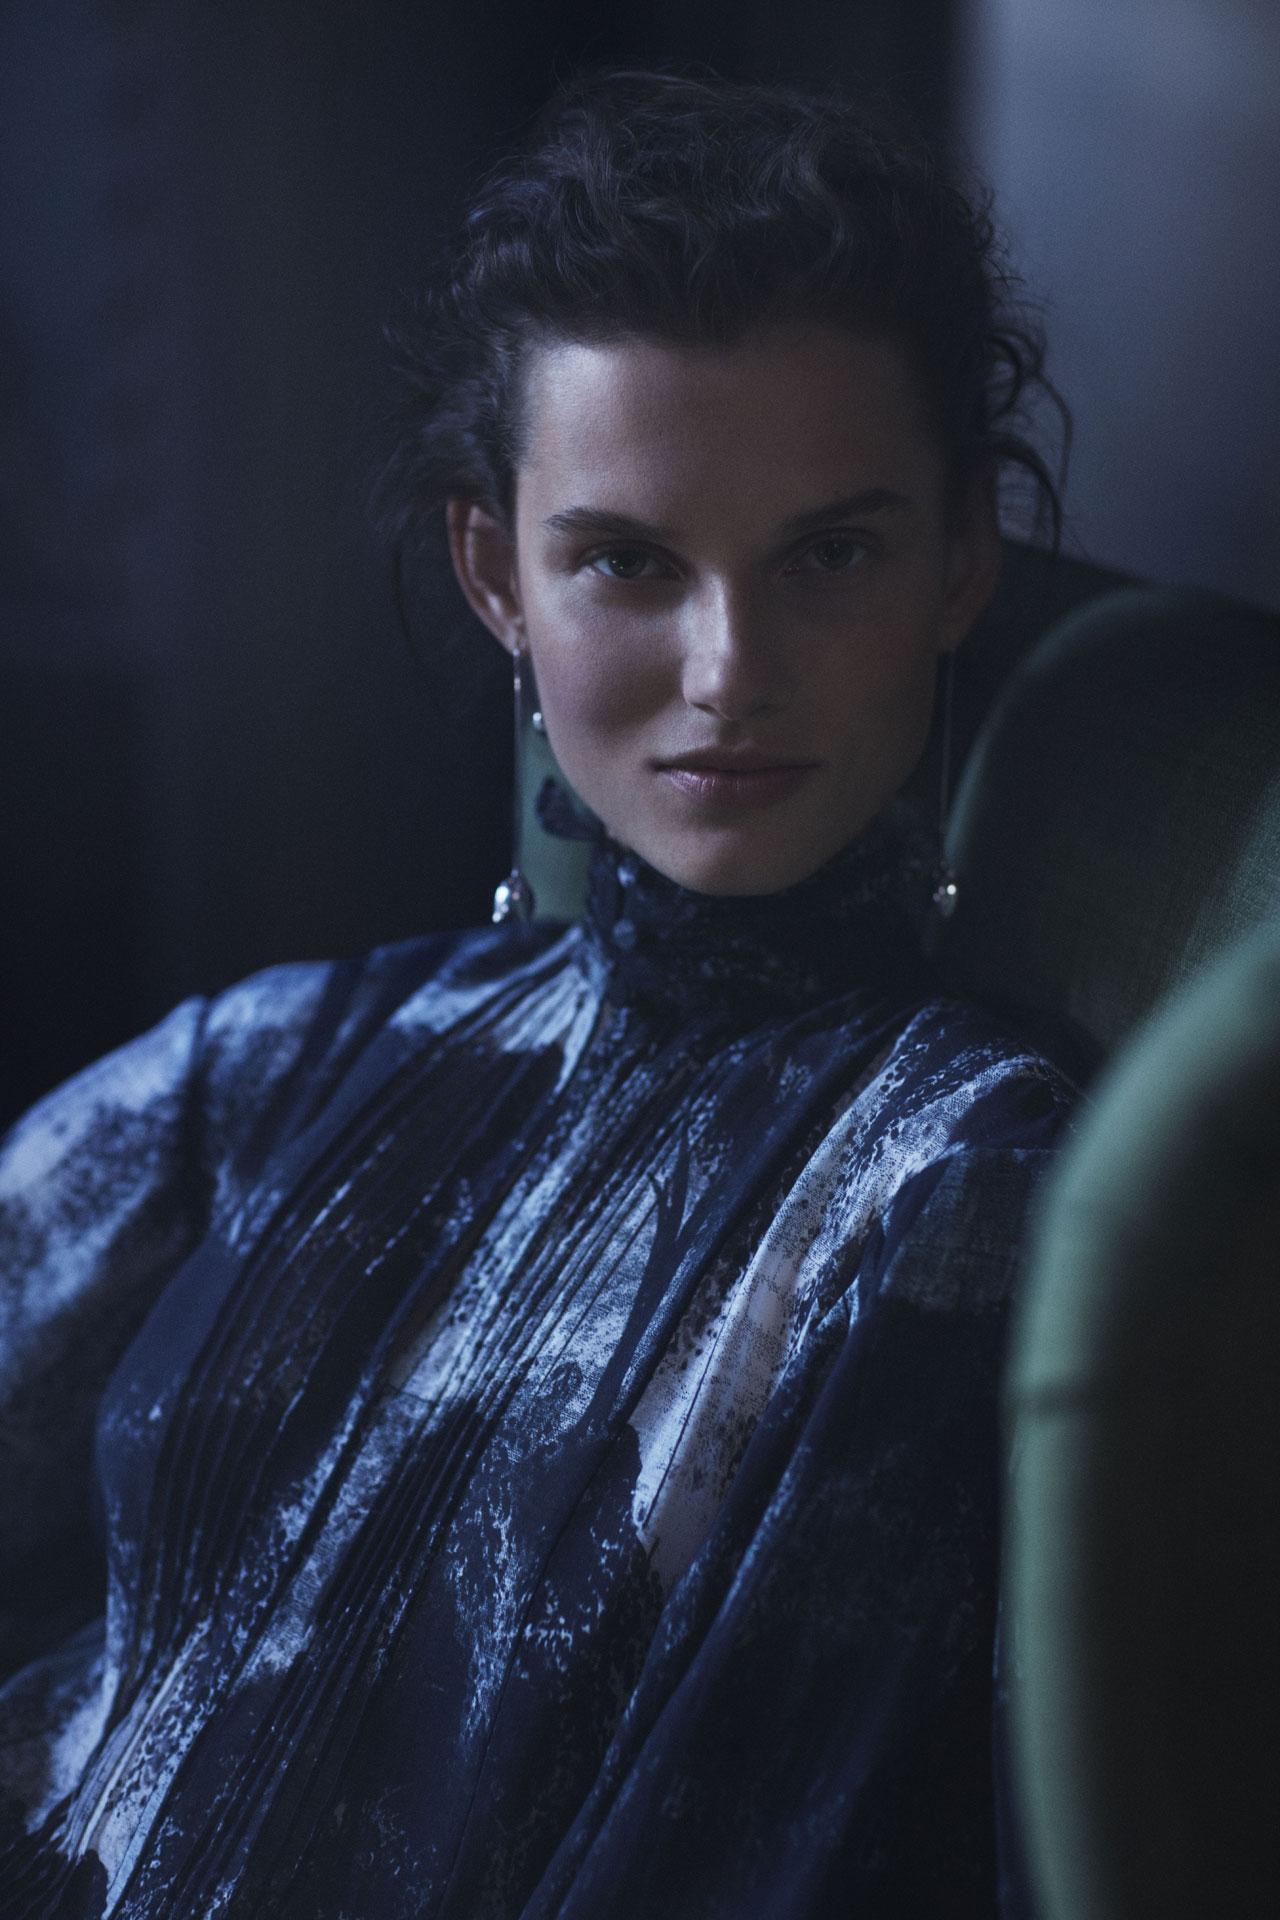 Giedrė Dukauskaitė.H&M Conscious Exclusive 2018 campaign.Photo by Mikael Jansson © H&M.